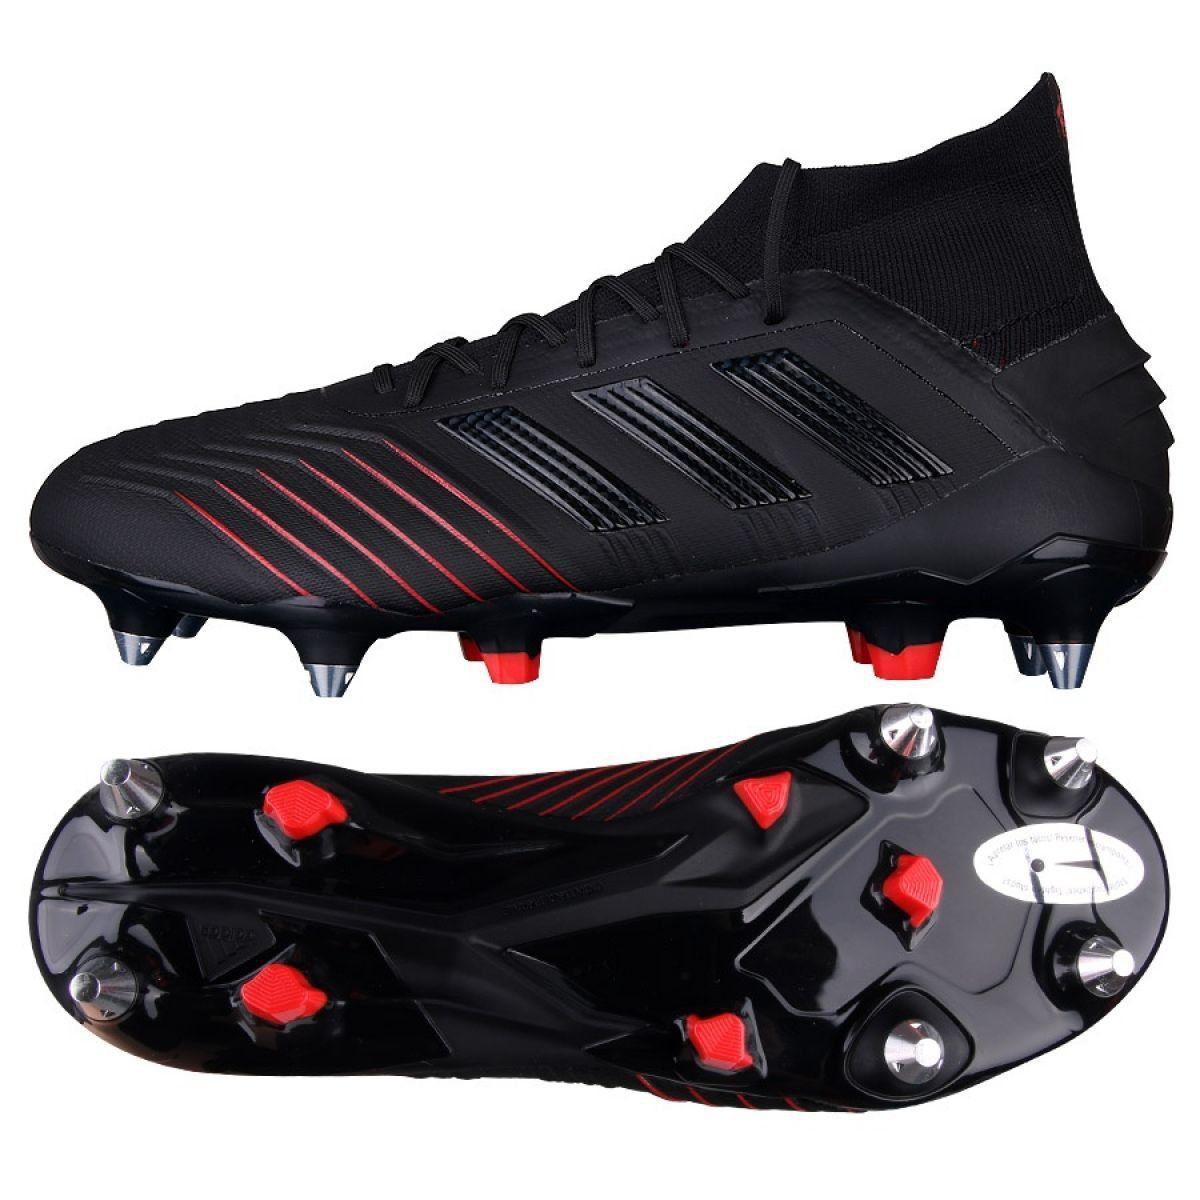 Football Boots Adidas Predator 19 1 Sg M G26979 Black Black Football Boots Adidas Predator Football Shoes